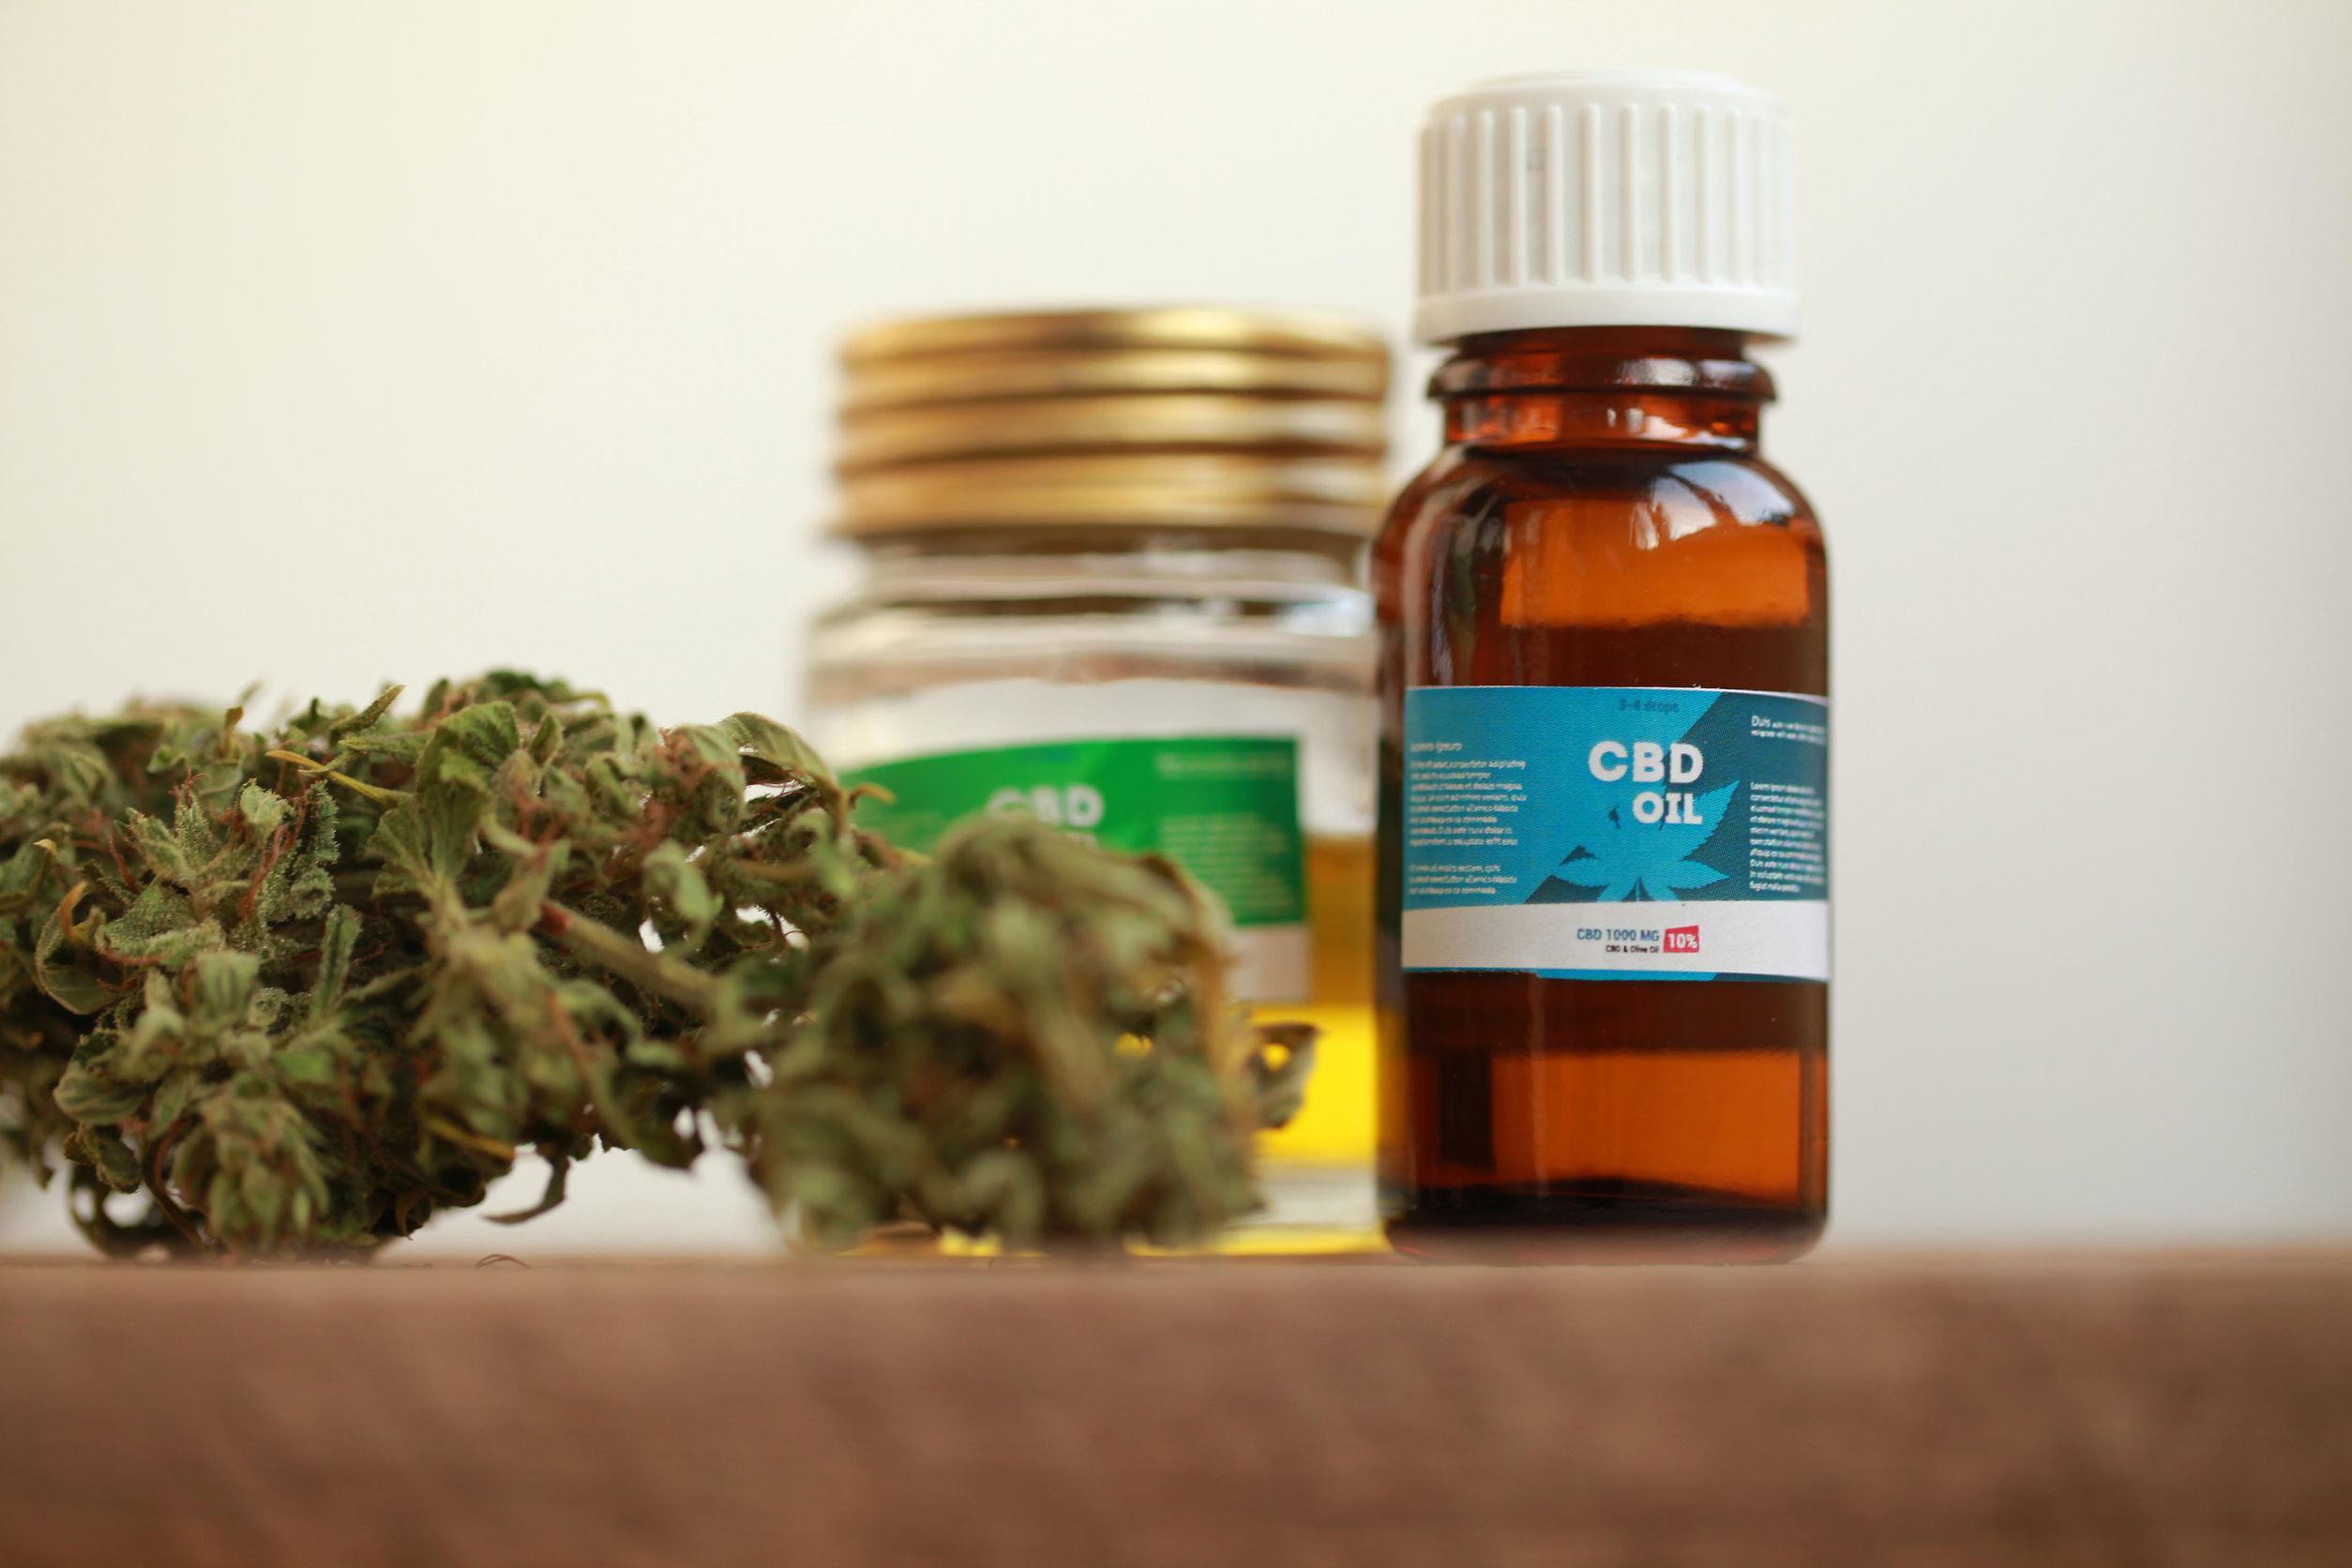 CBD Öl 10%: Test, Wirkung, Anwendung & Studien (09/20)